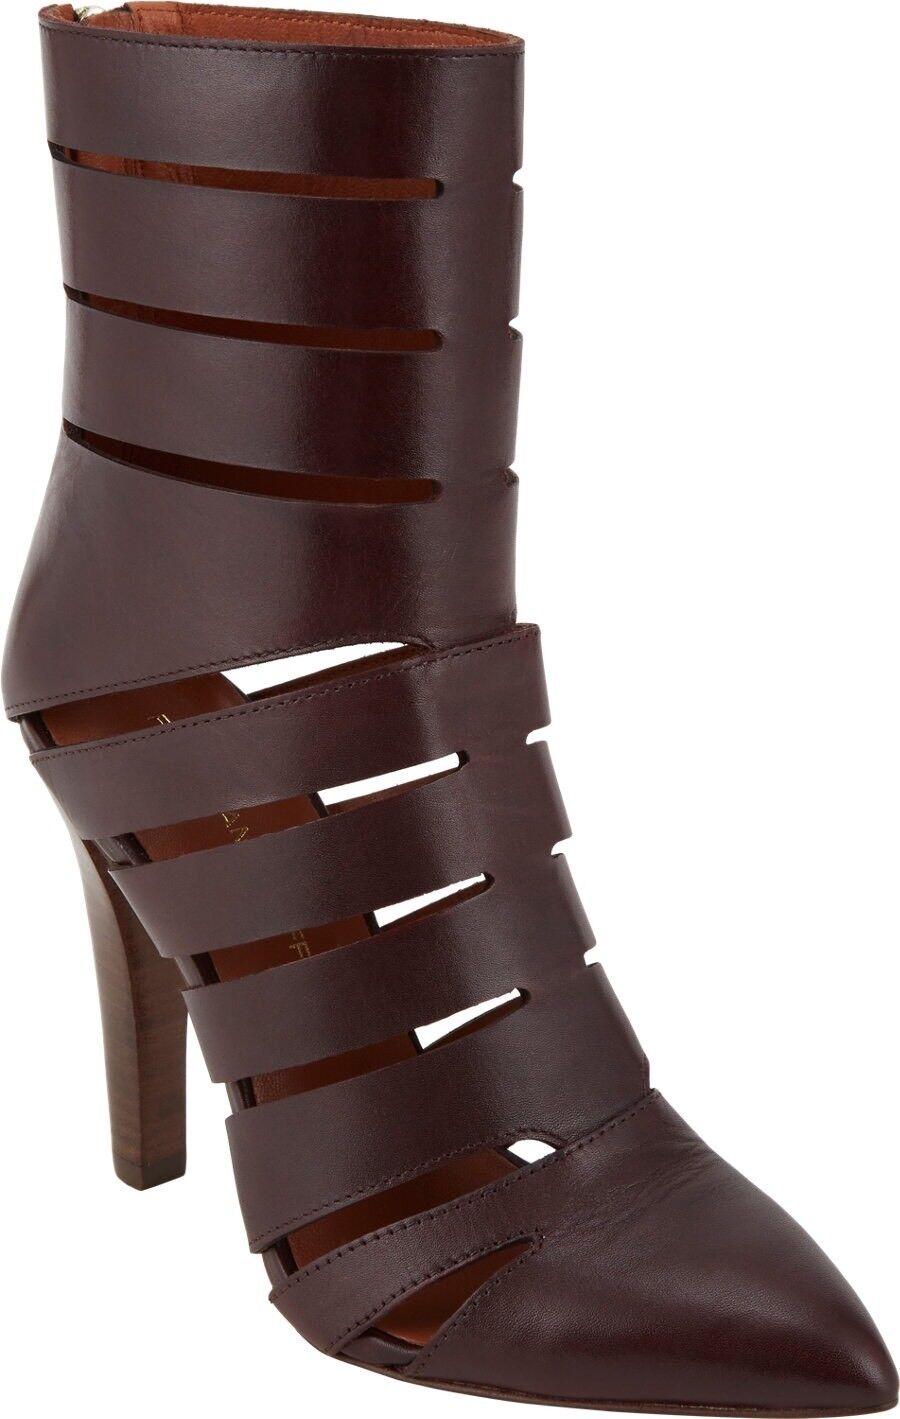 REBECCA MINKOFF Women's Dark Brown Derea Cutout Booties Sz 9M 395 NEW